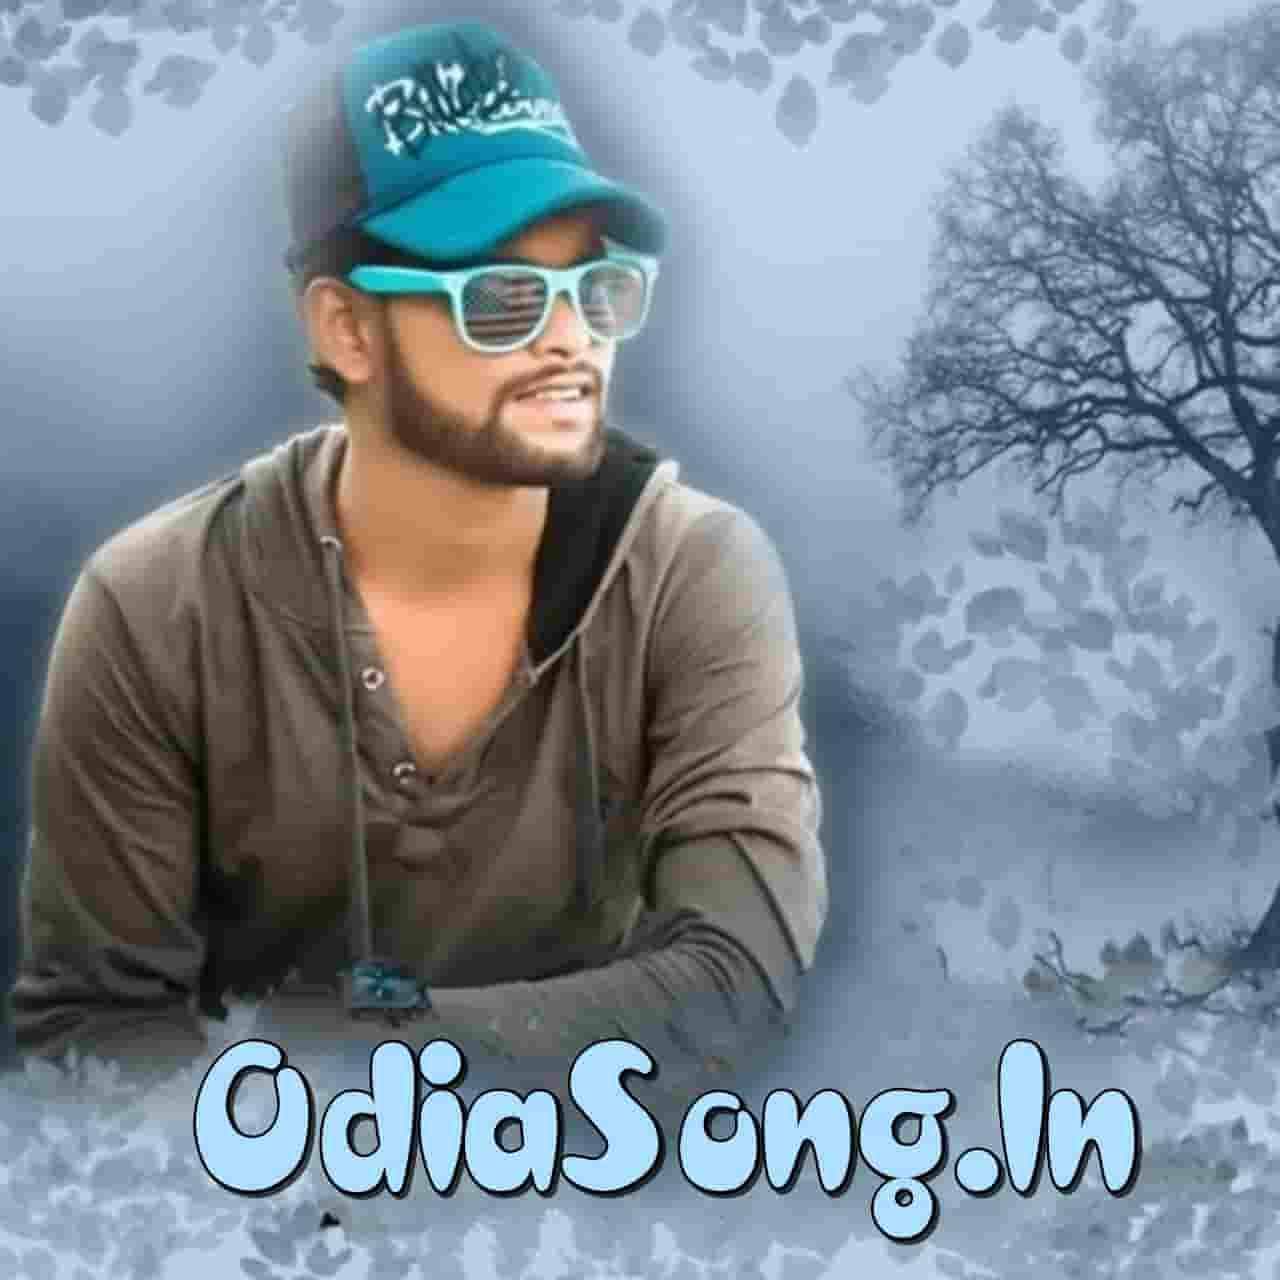 Aa Mor Gadine Basiaa (Kundal K Chhura, Bijneshi Barik)